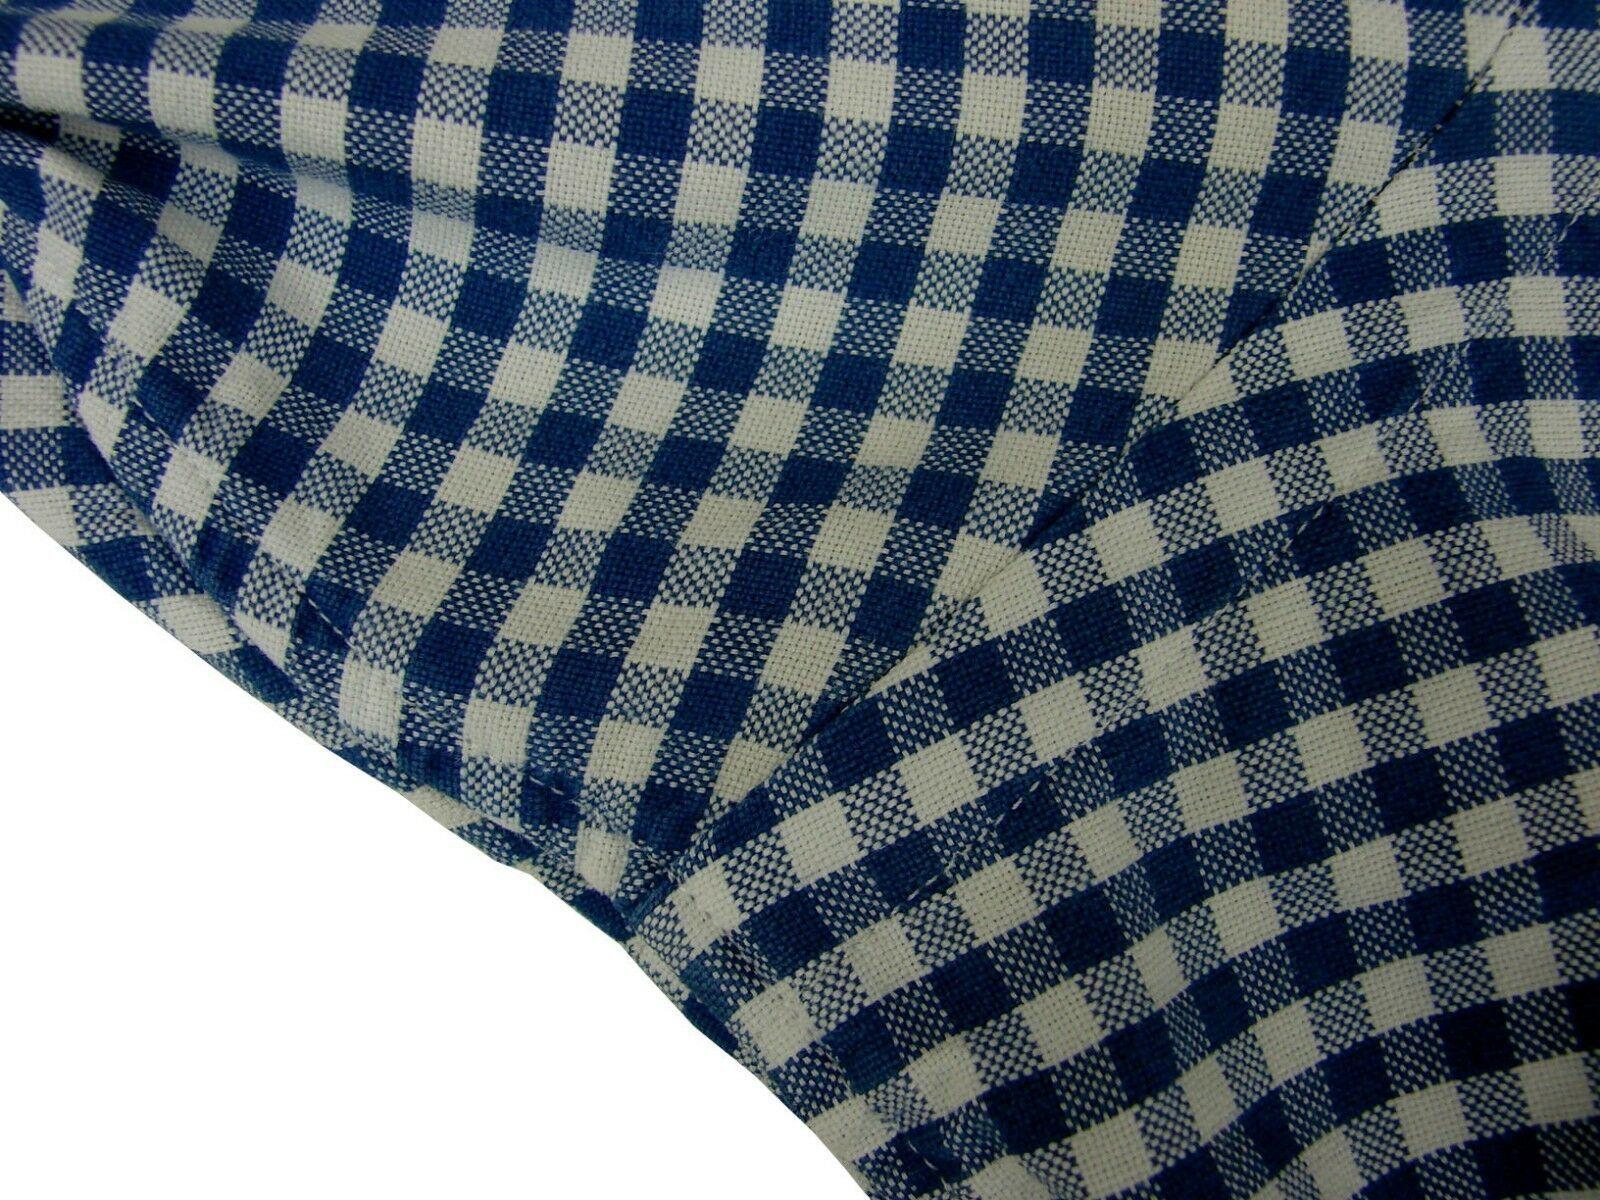 RALPH LAUREN POLO Shirt Mens 15 S Blue & White Gingham Check CLASSIC FIT